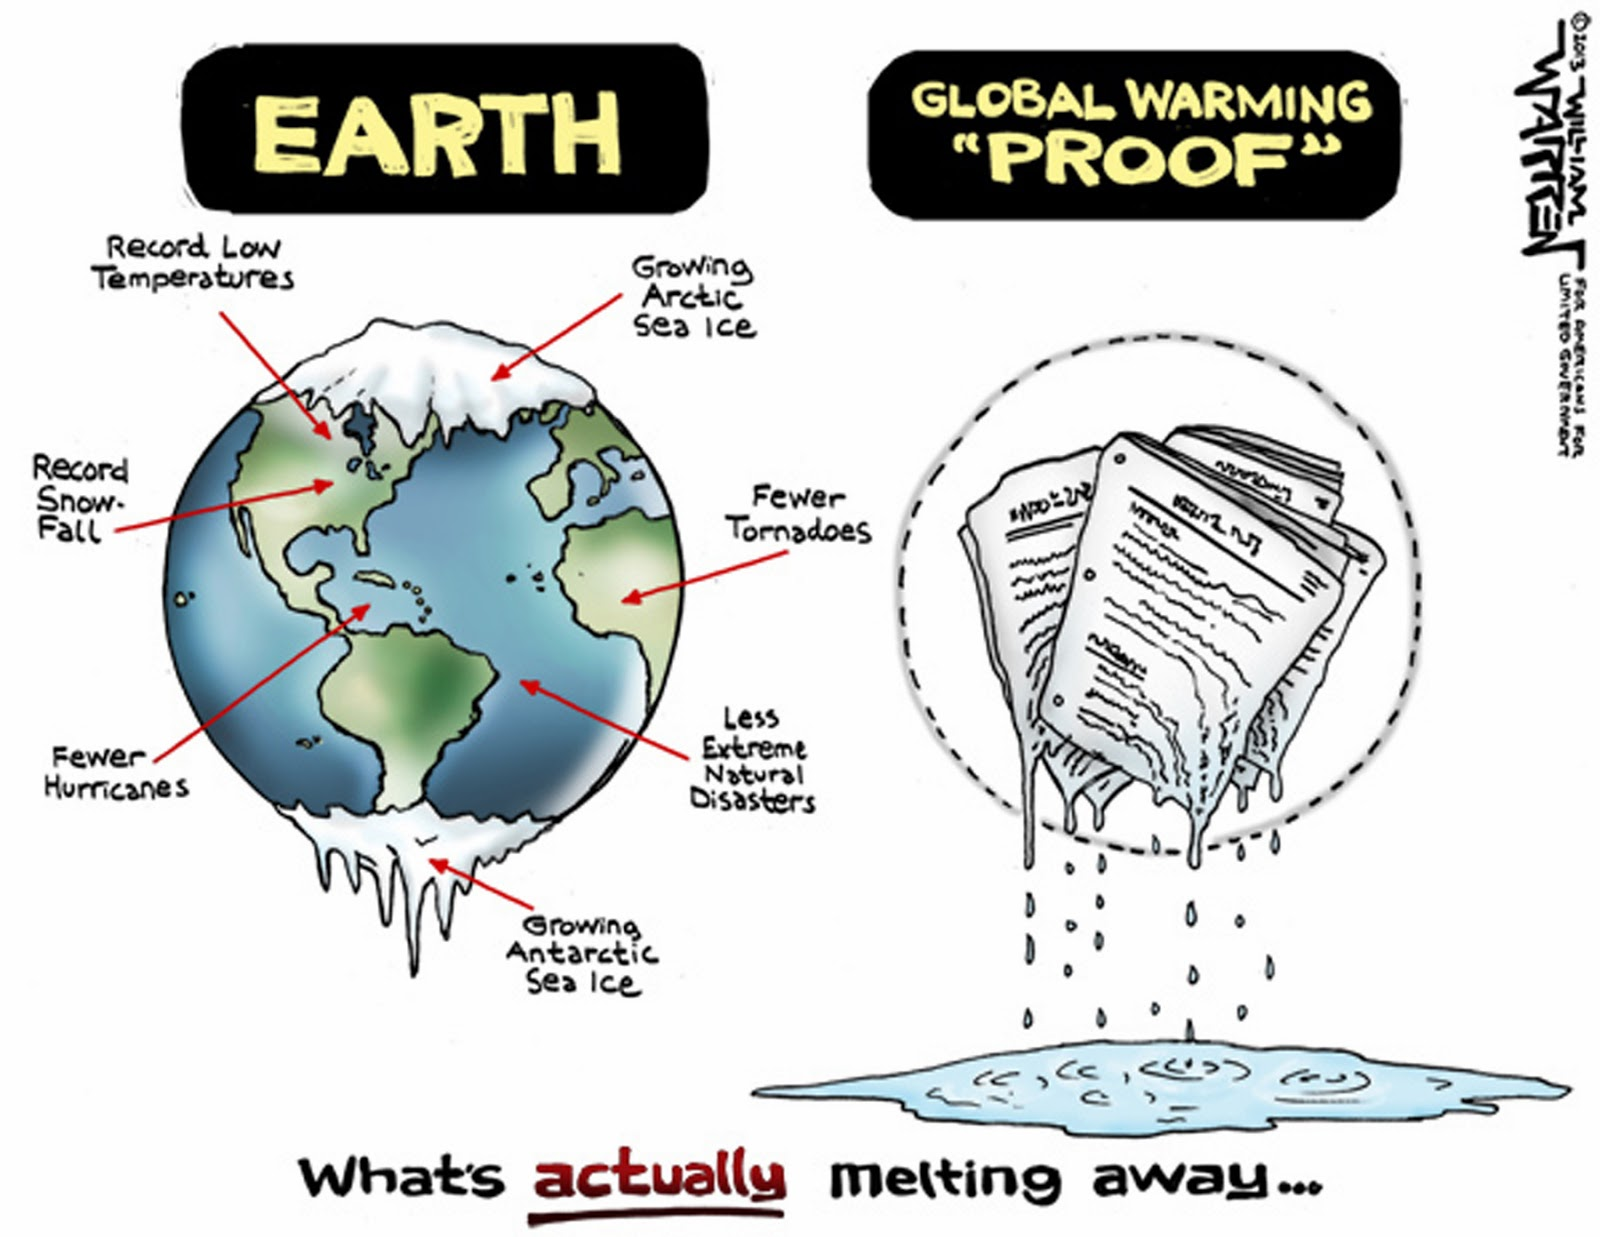 Tony phyrillas on politics global warming proof is melting